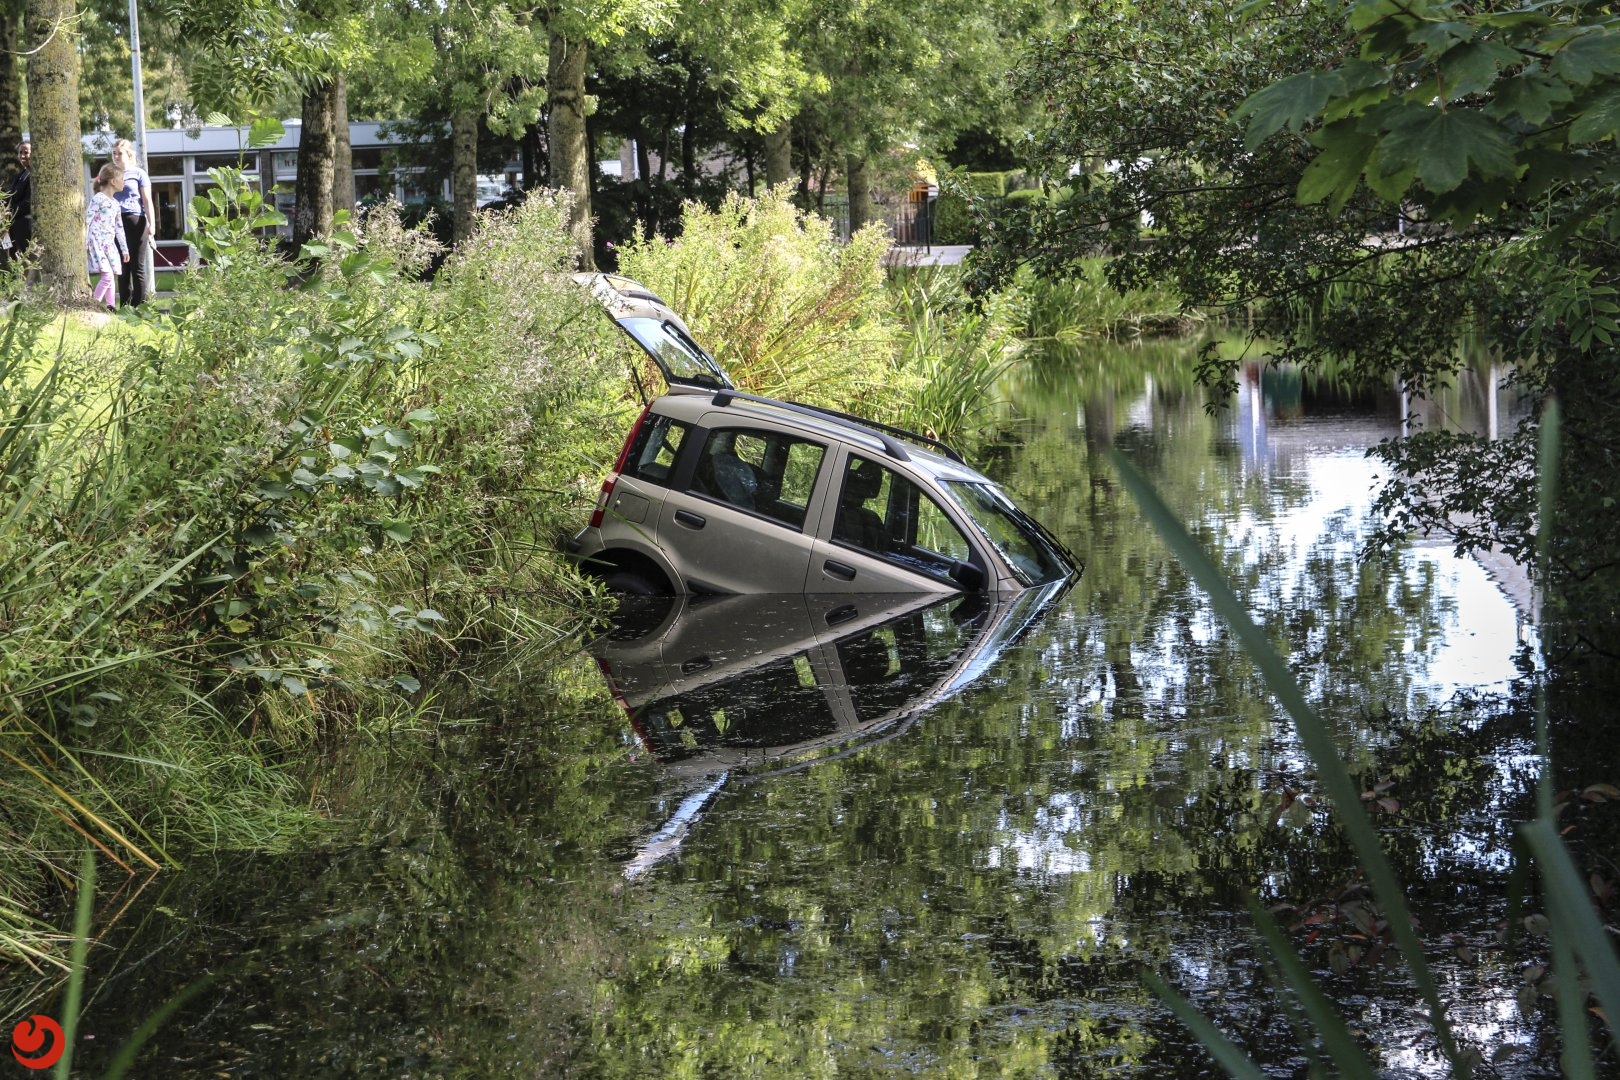 Vrouw raakt met auto te water na onwelwording